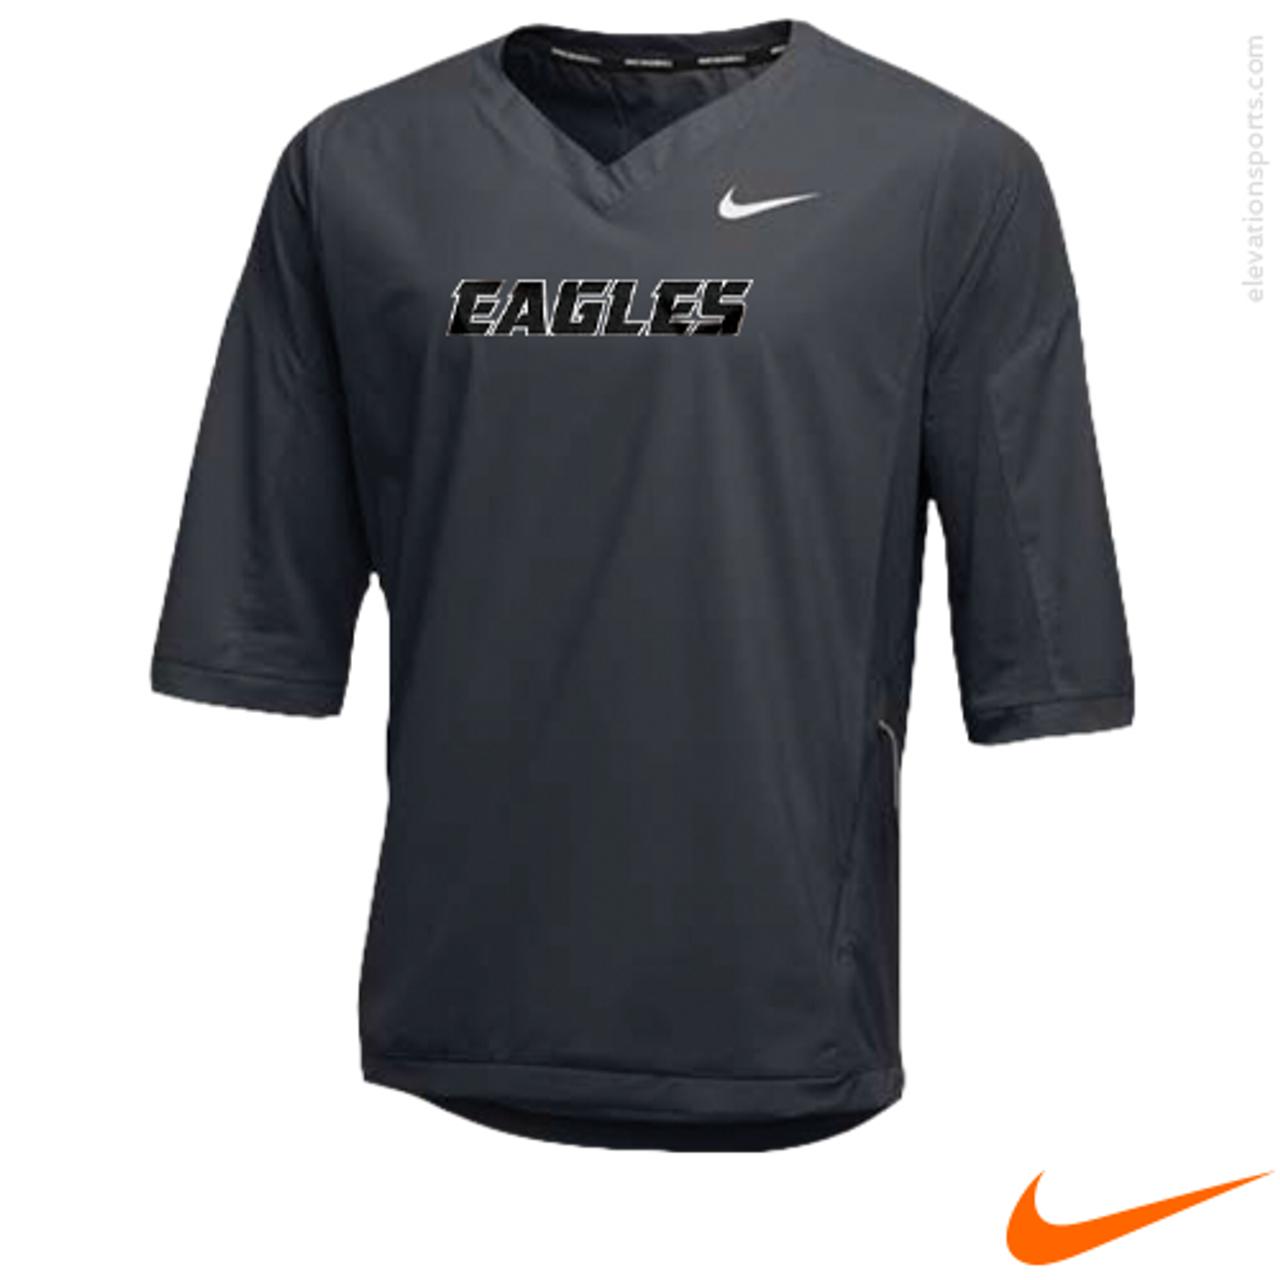 Nike 3 4 Sleeve Custom Cage Jackets Elevation Sports